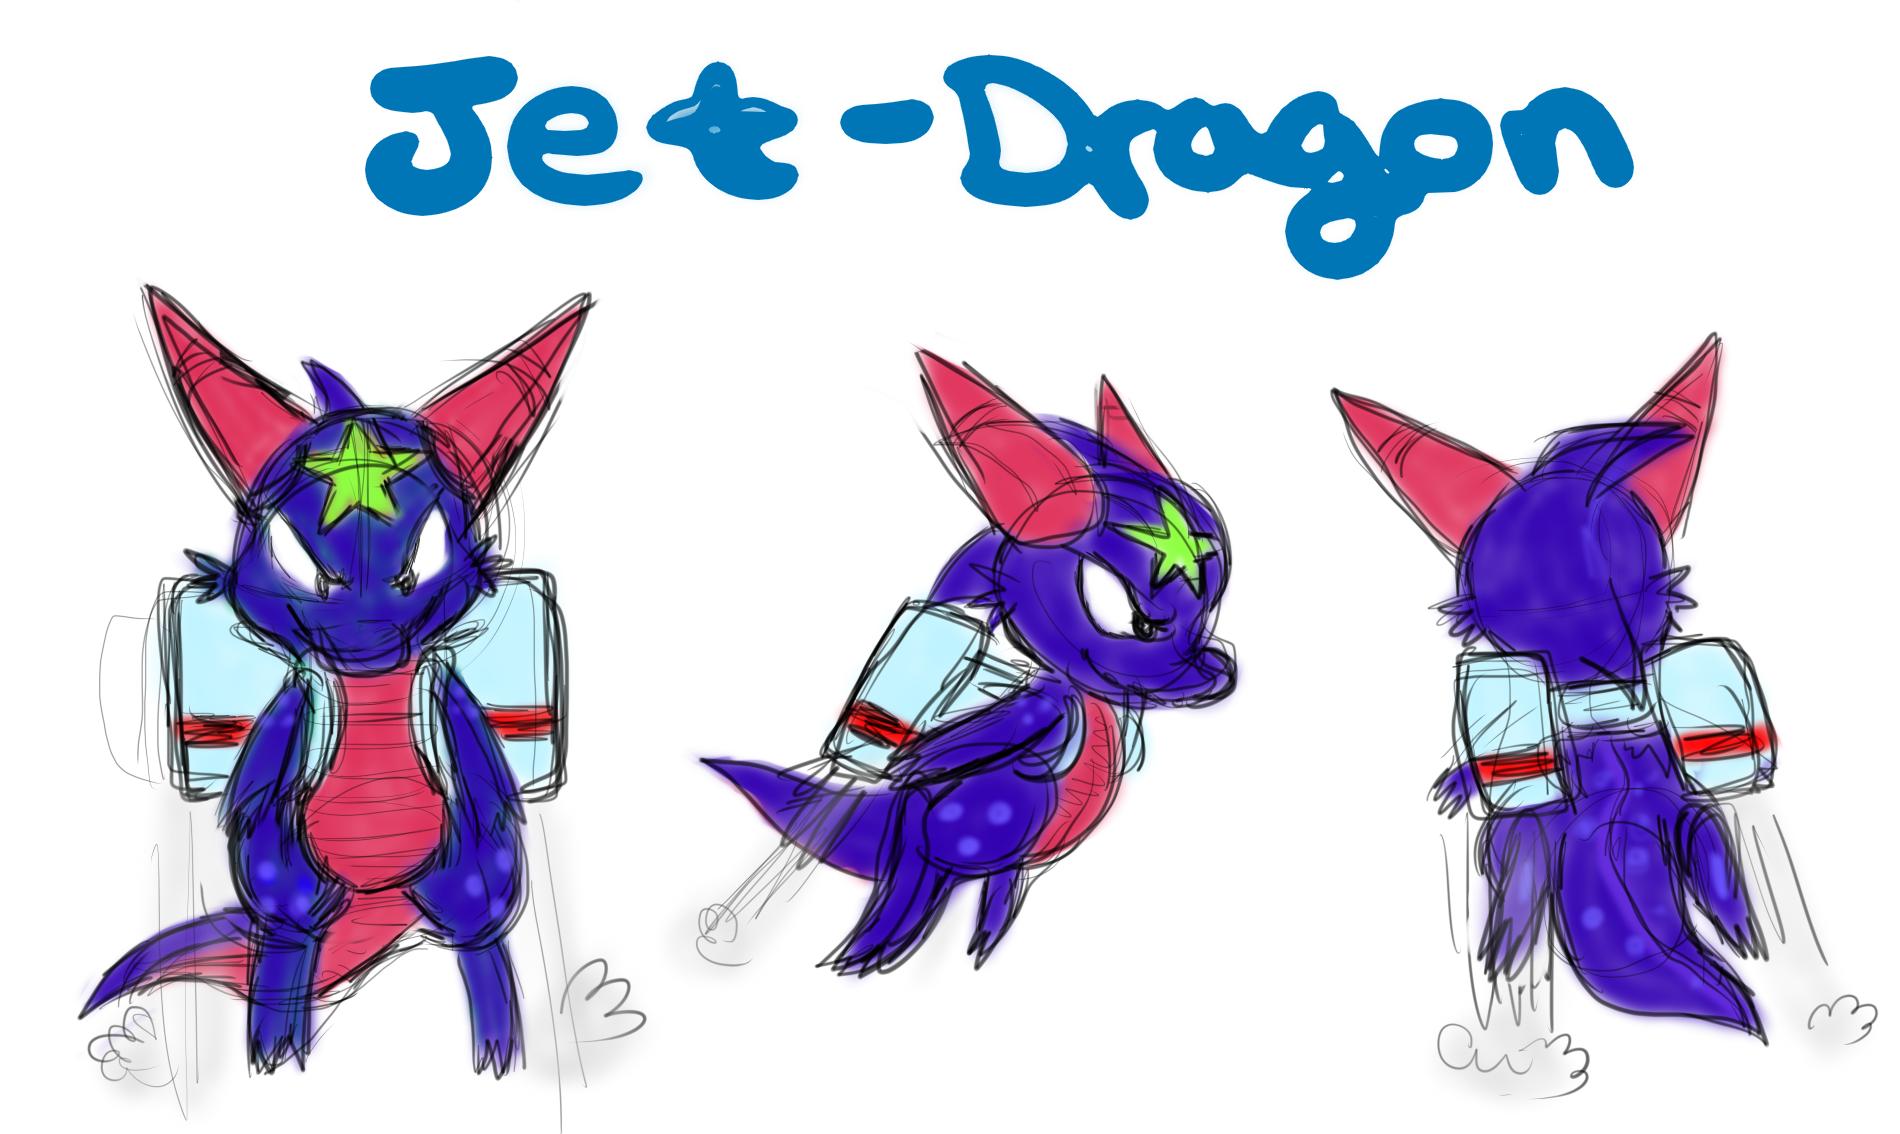 Jet-Dragon Concept Art